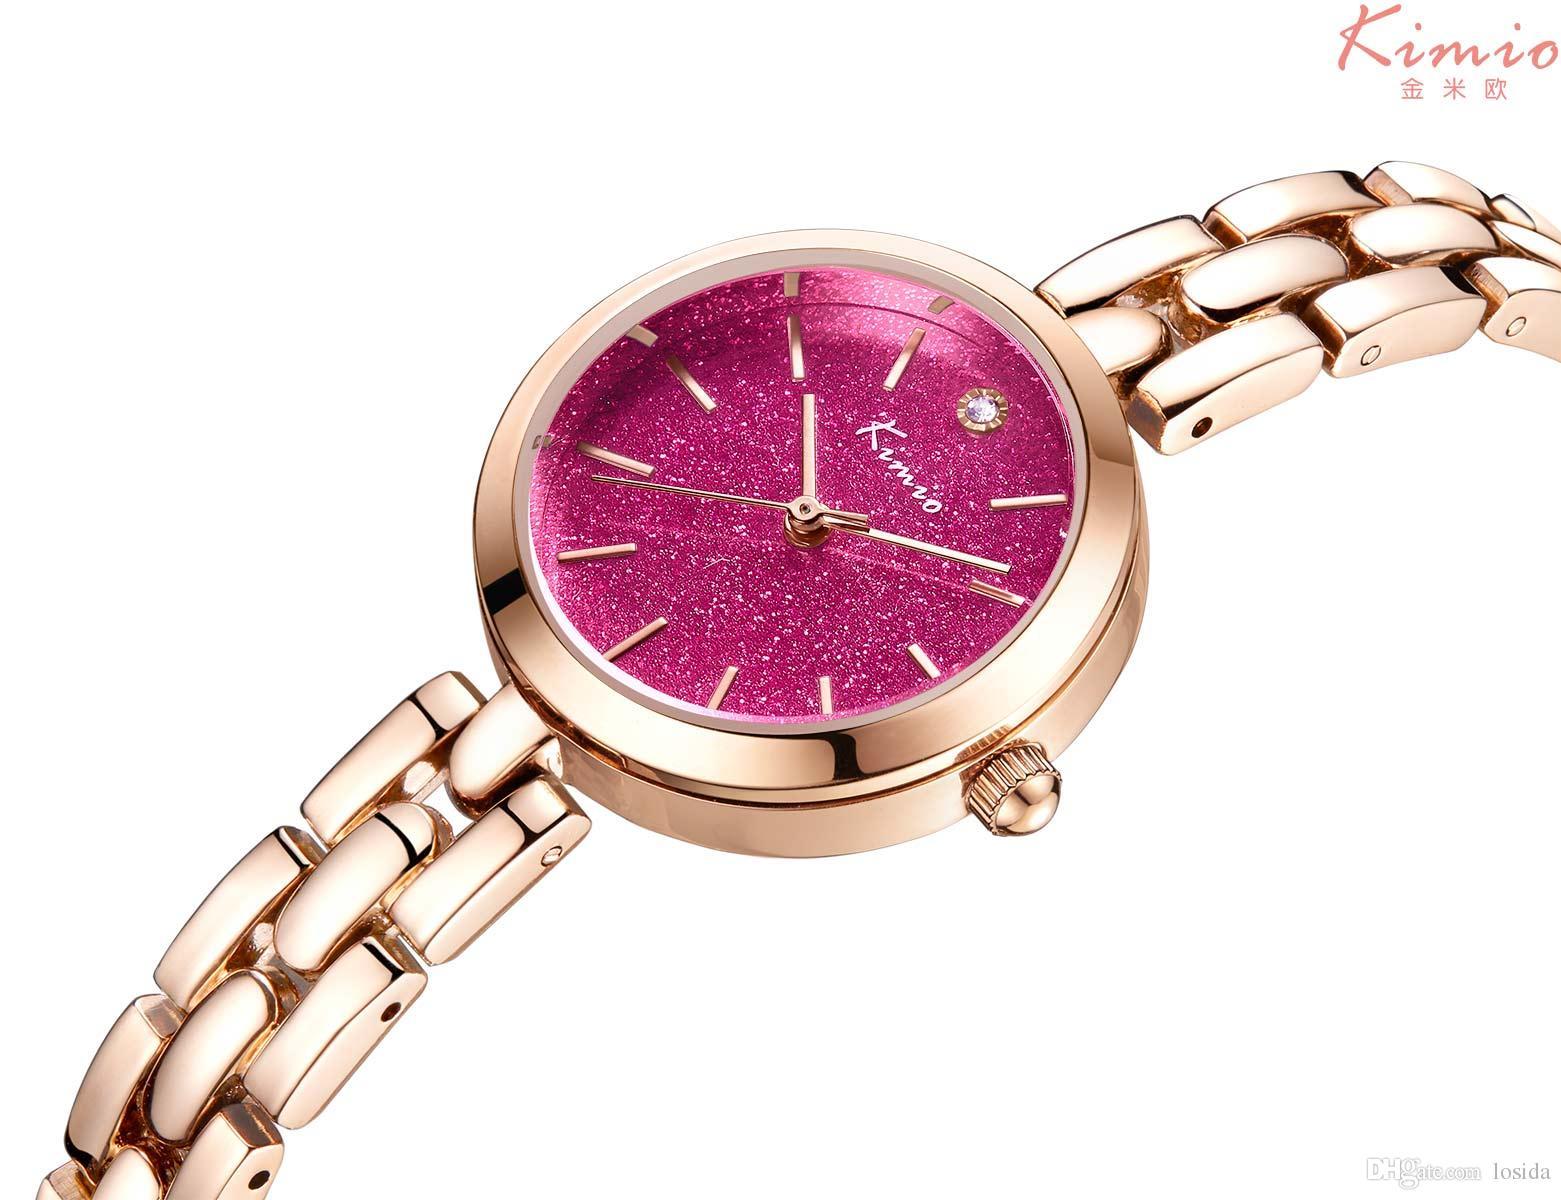 Blumen Genf Uhren Modische Stilvolle Quarz Armband Damen Diamant Armband Uhr 2019 Uhr Leder Armbanduhren Femme Uhren